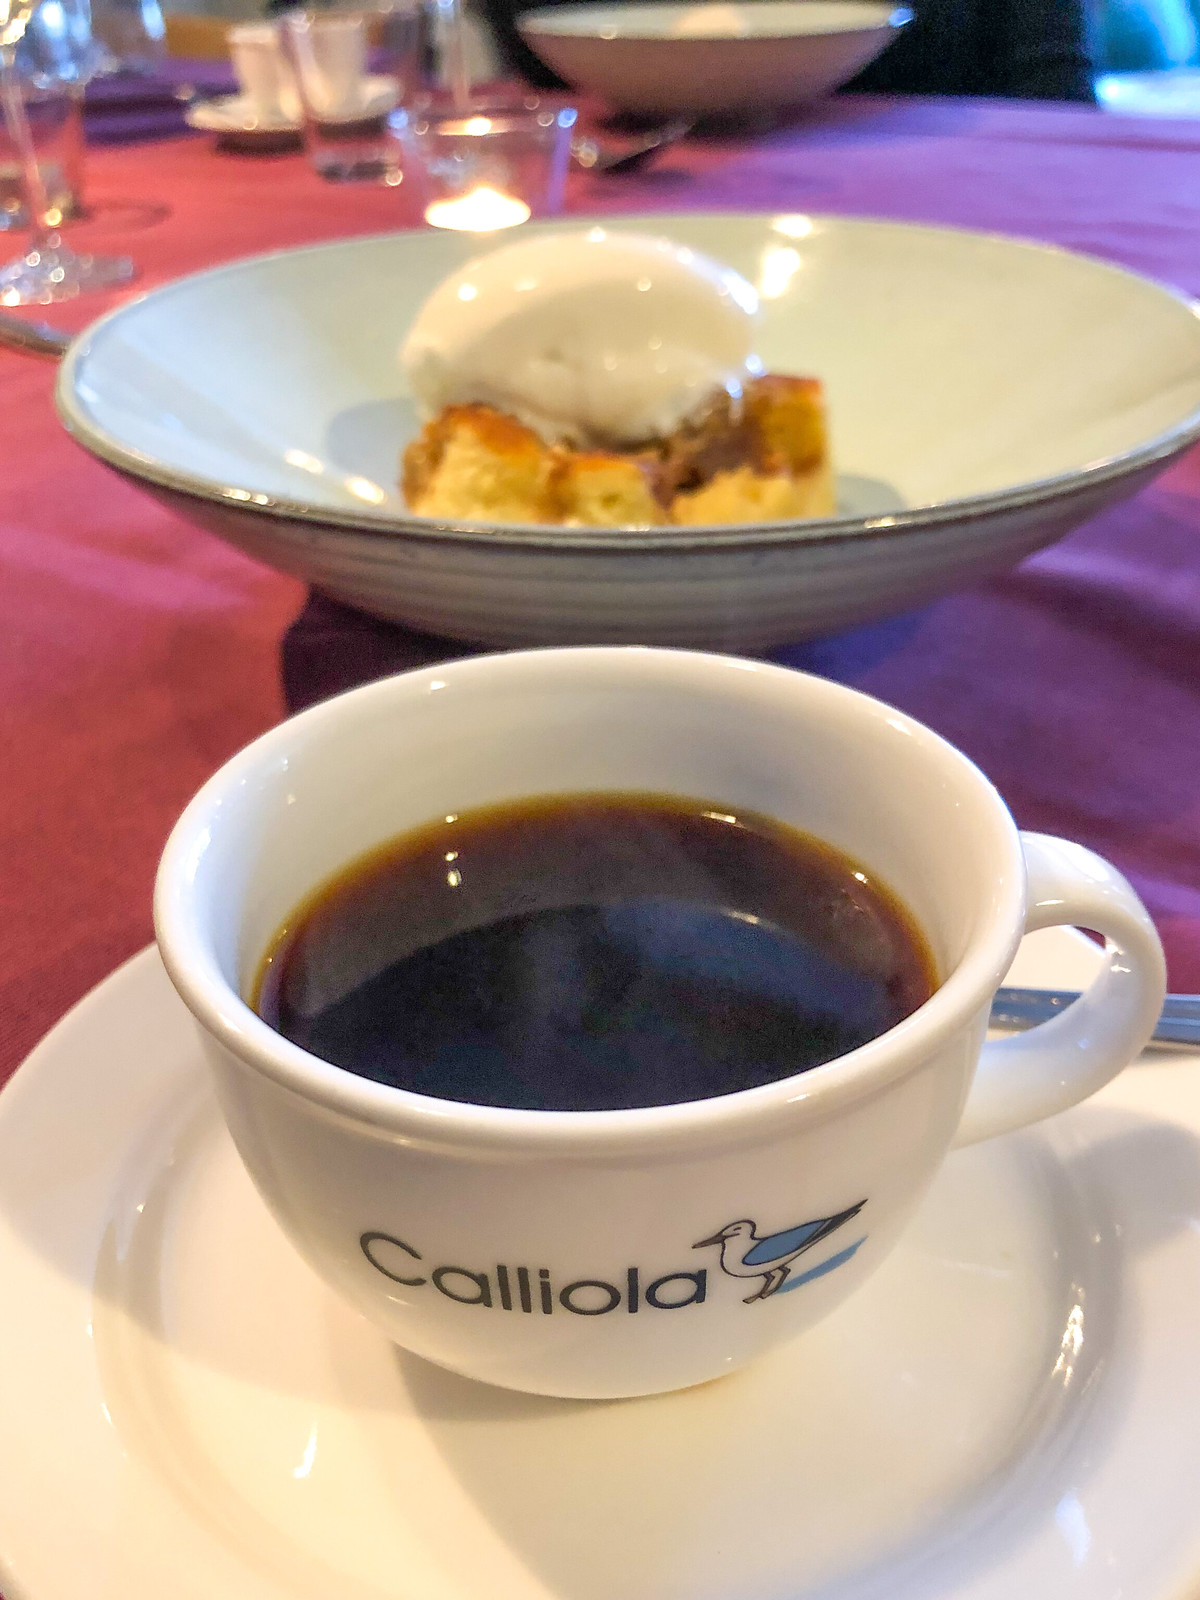 Calliola